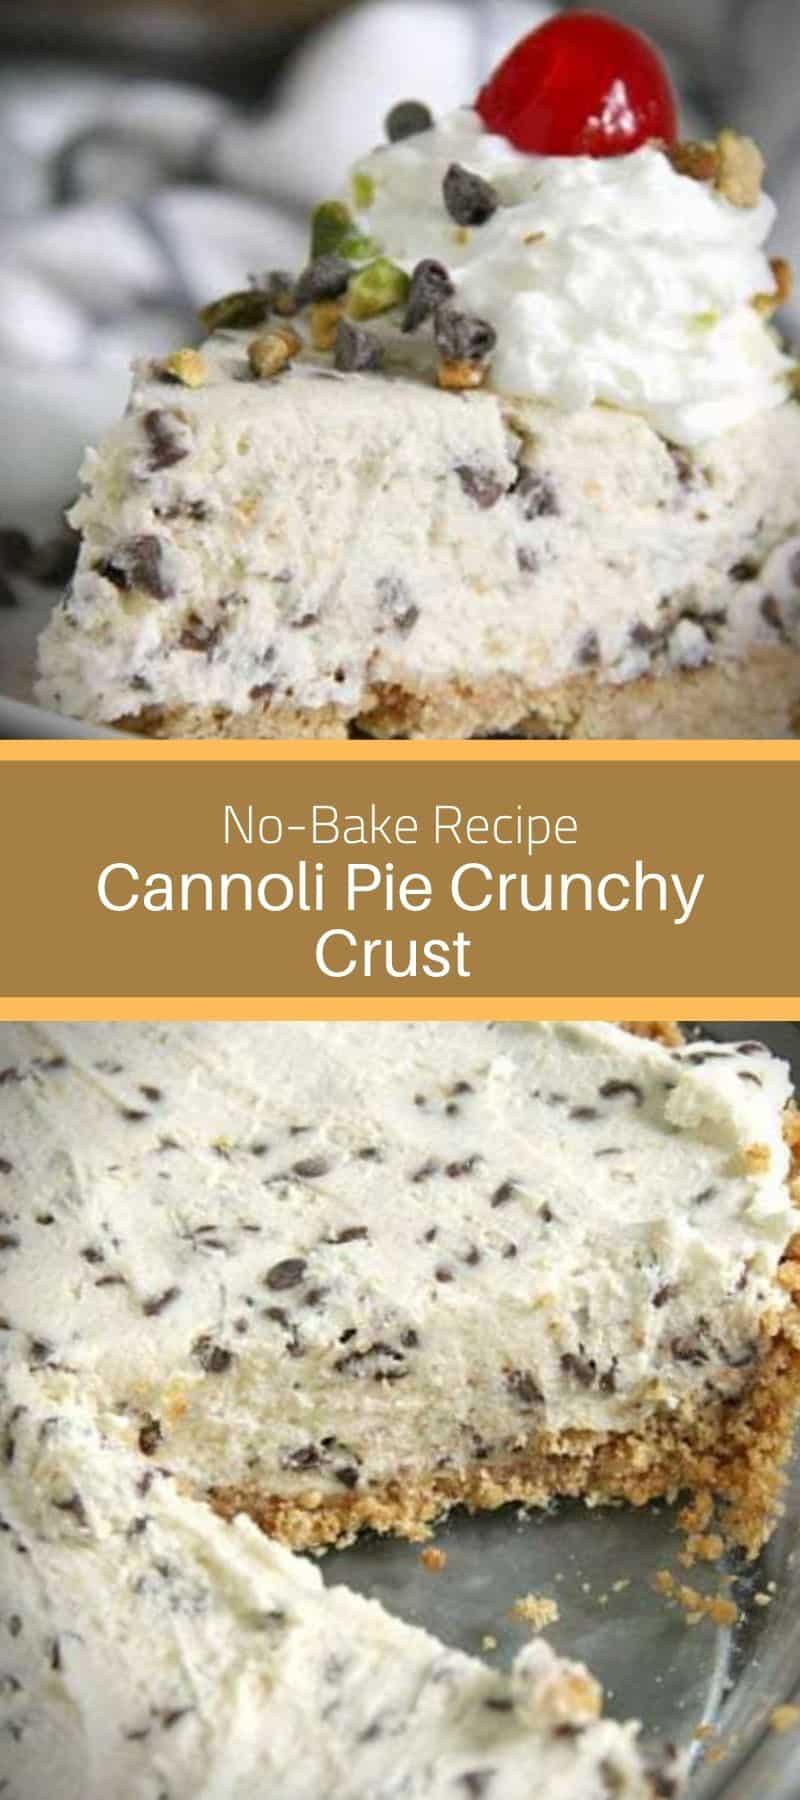 No-Bake Cannoli Pie Crunchy Crust Recipe 3